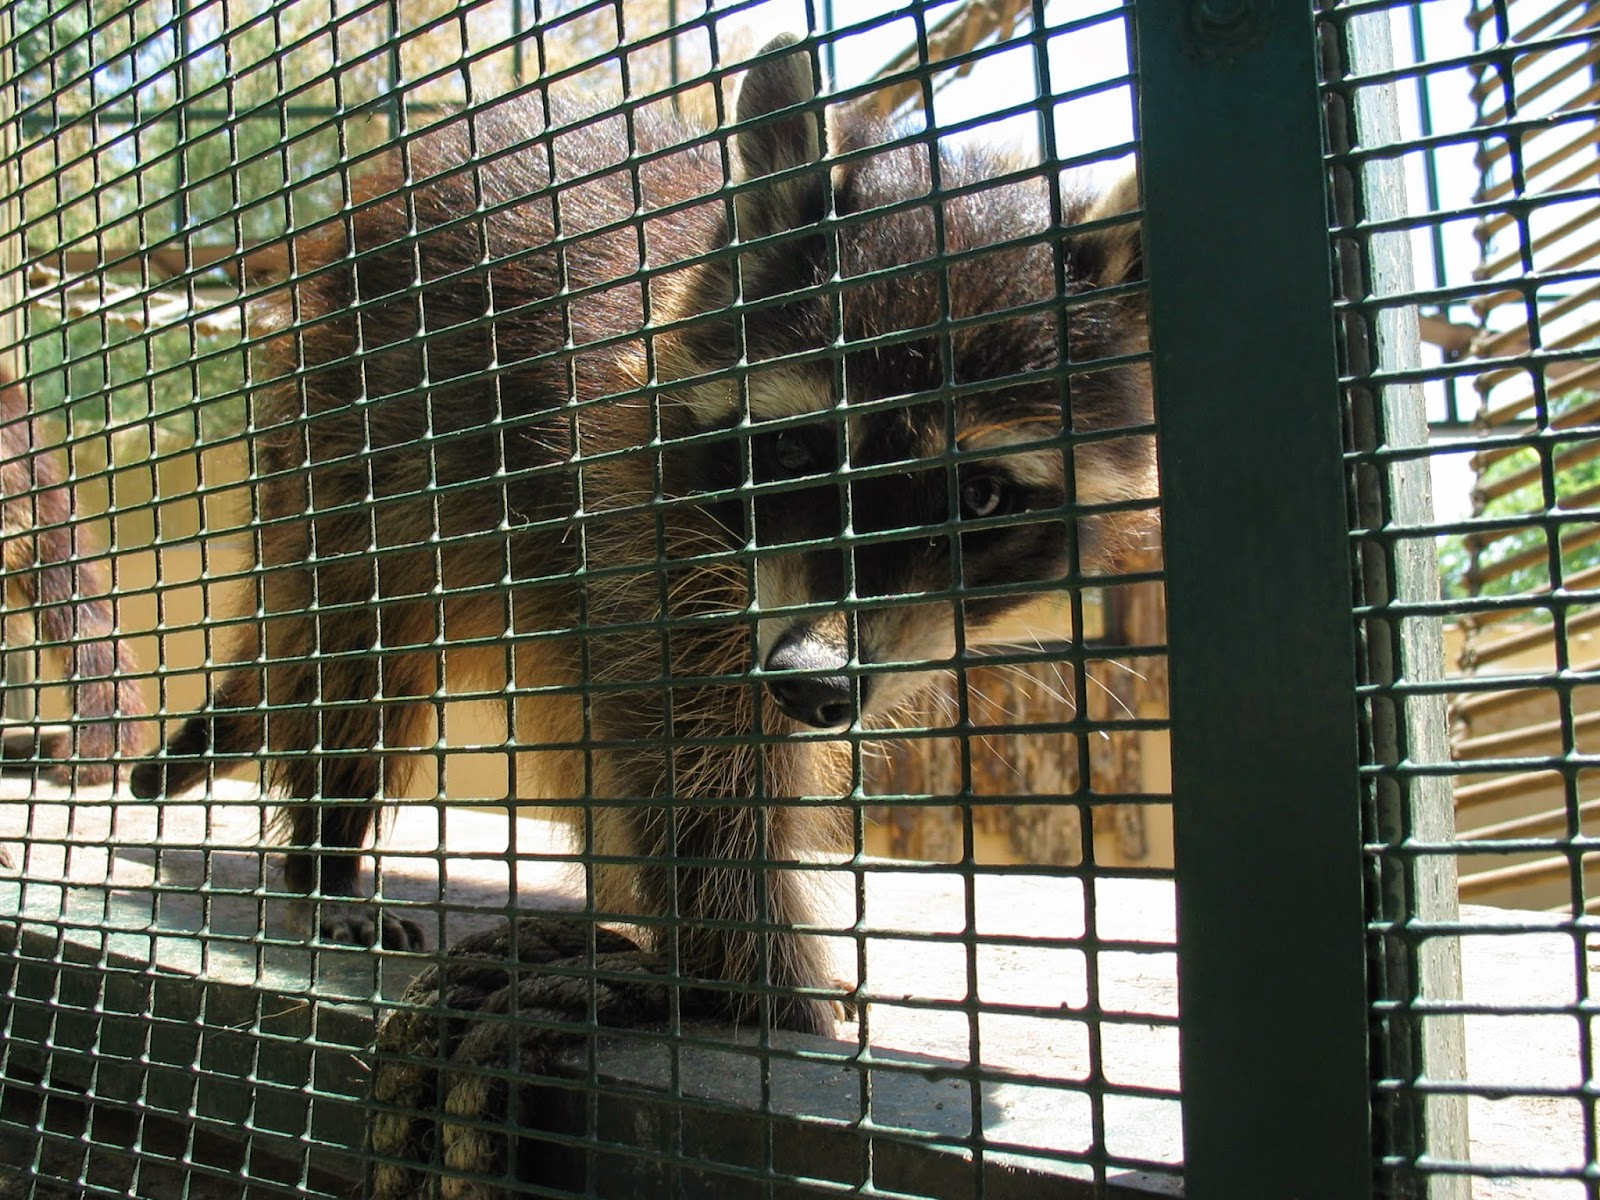 Зоопарк в Стамбуле